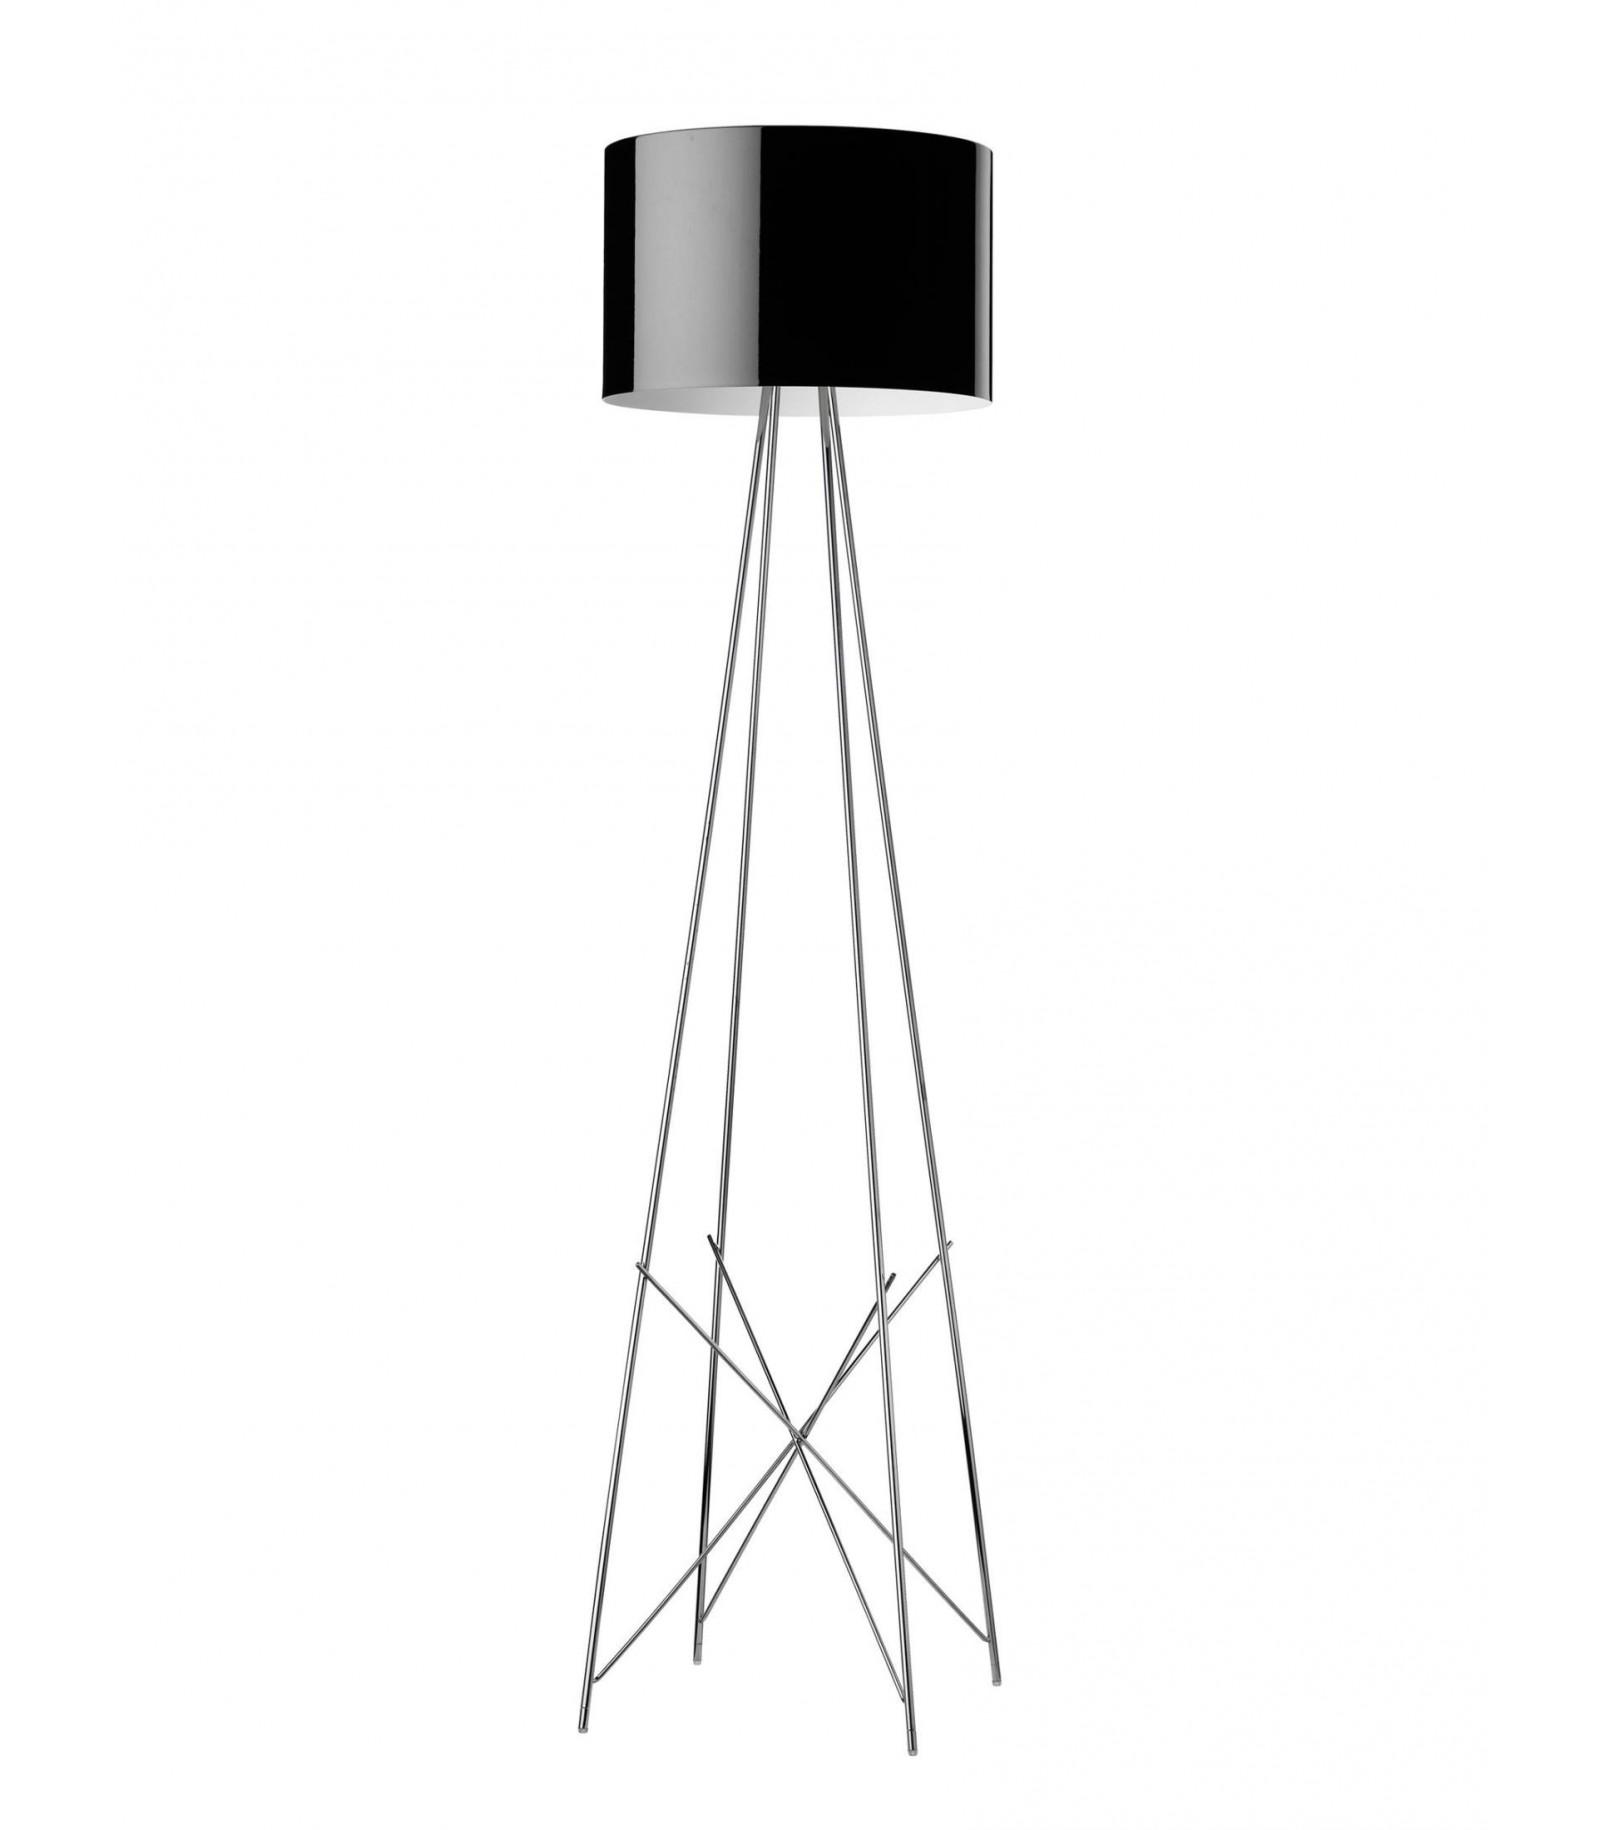 Lampada da terra ray f2 di flos Lampade da esterno da terra ikea